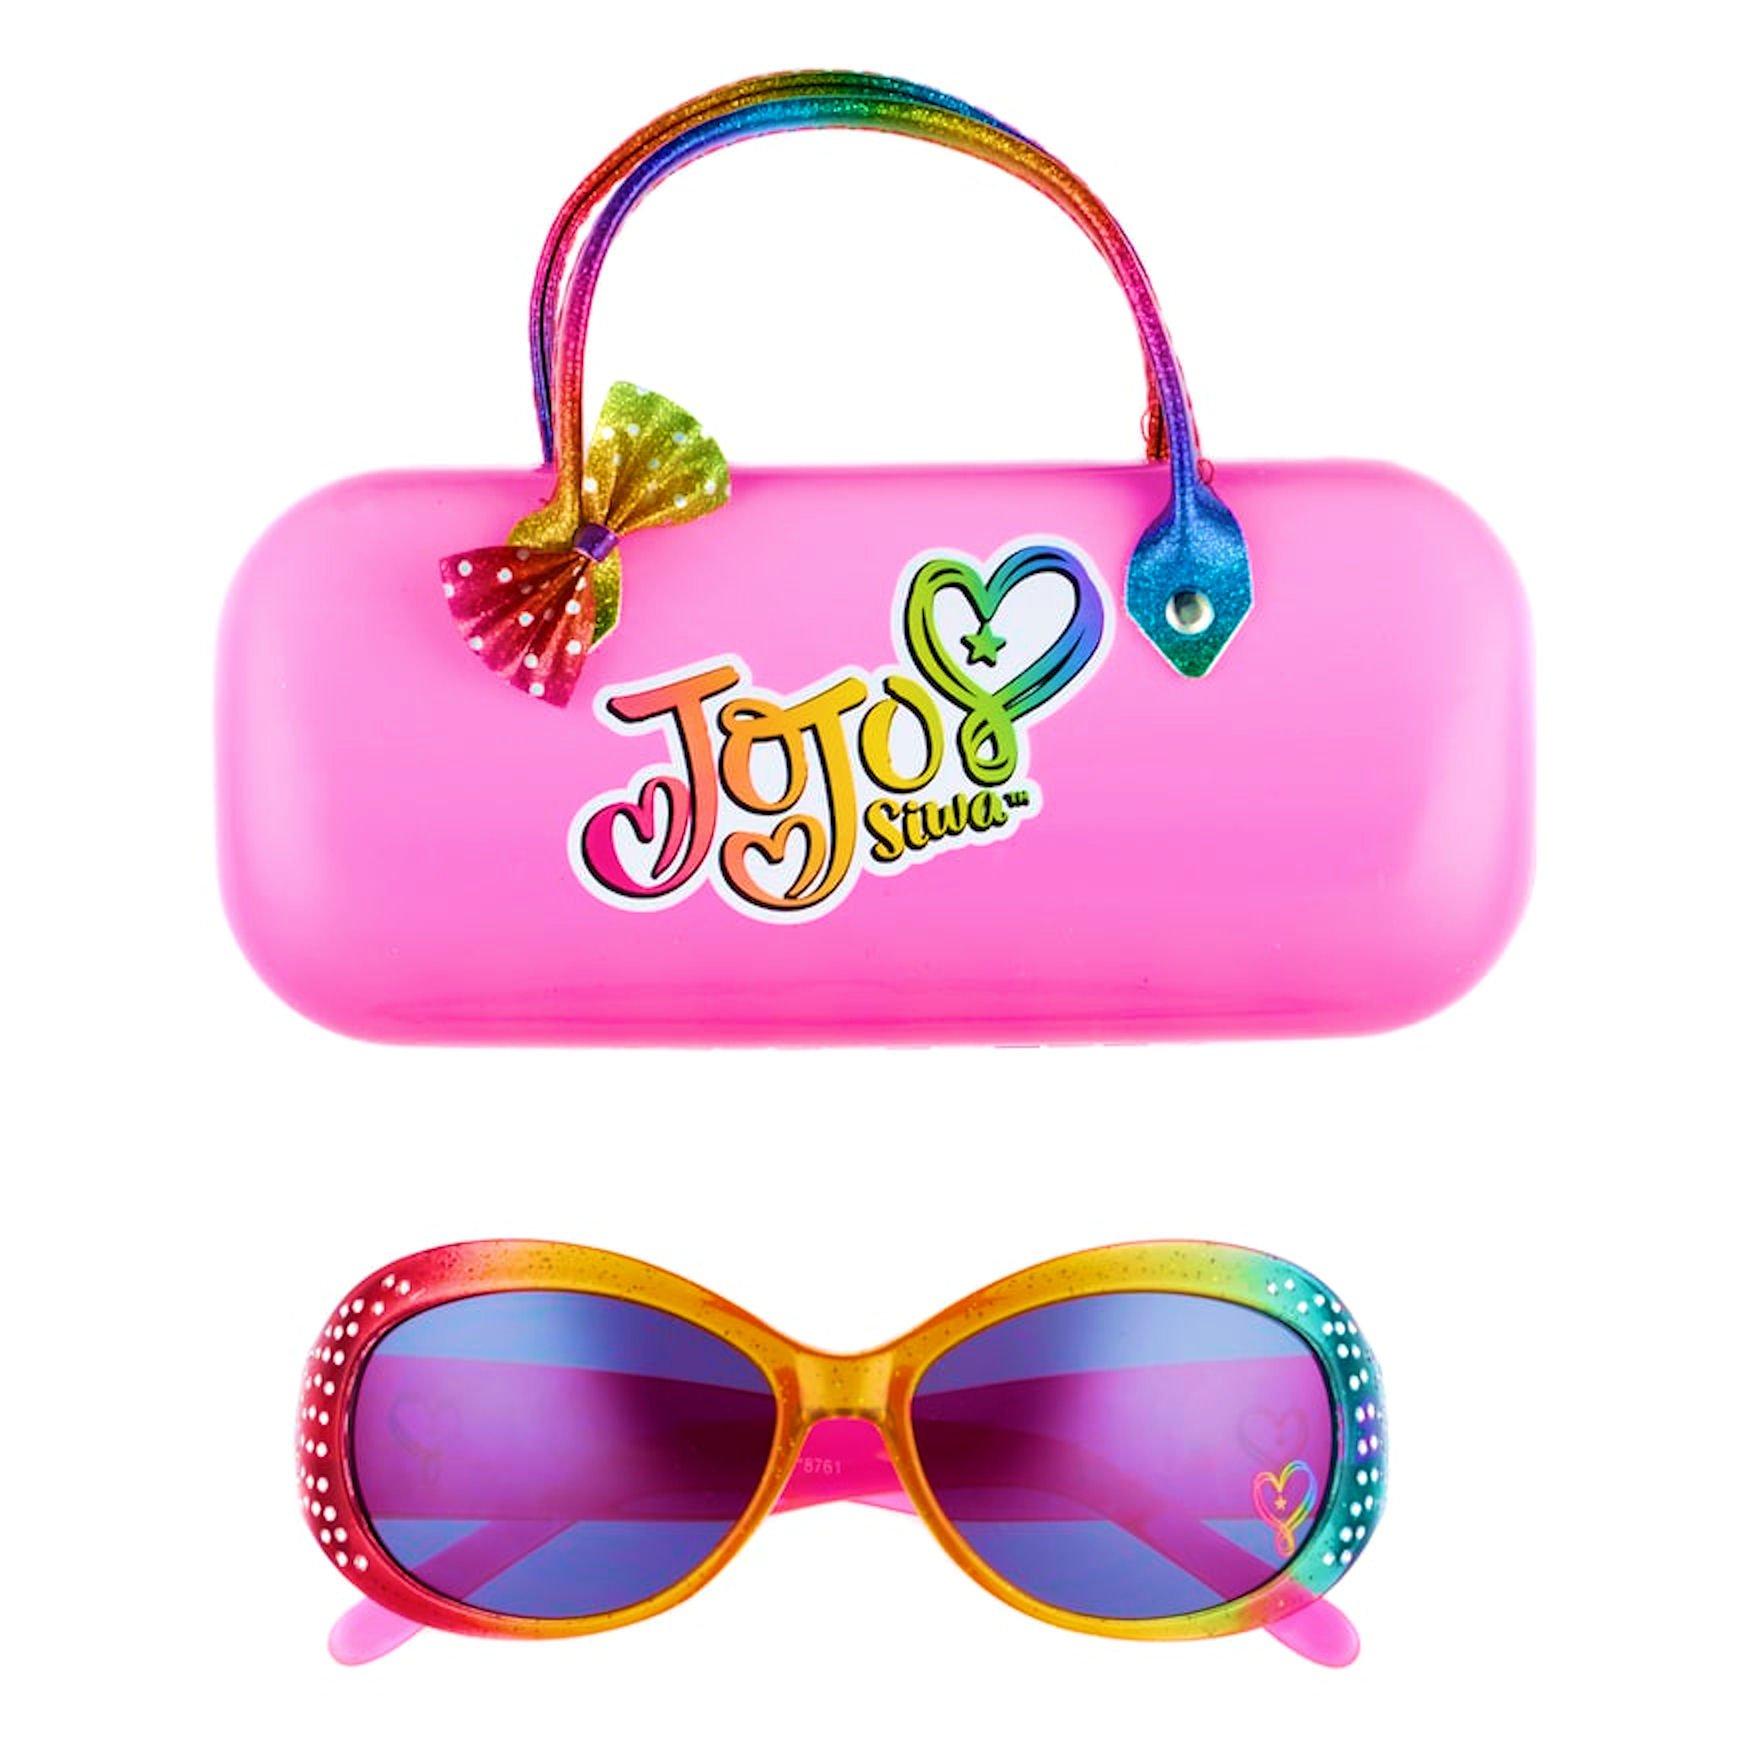 JoJo Siwa Rainbow Rhinestone Sunglasses with Case